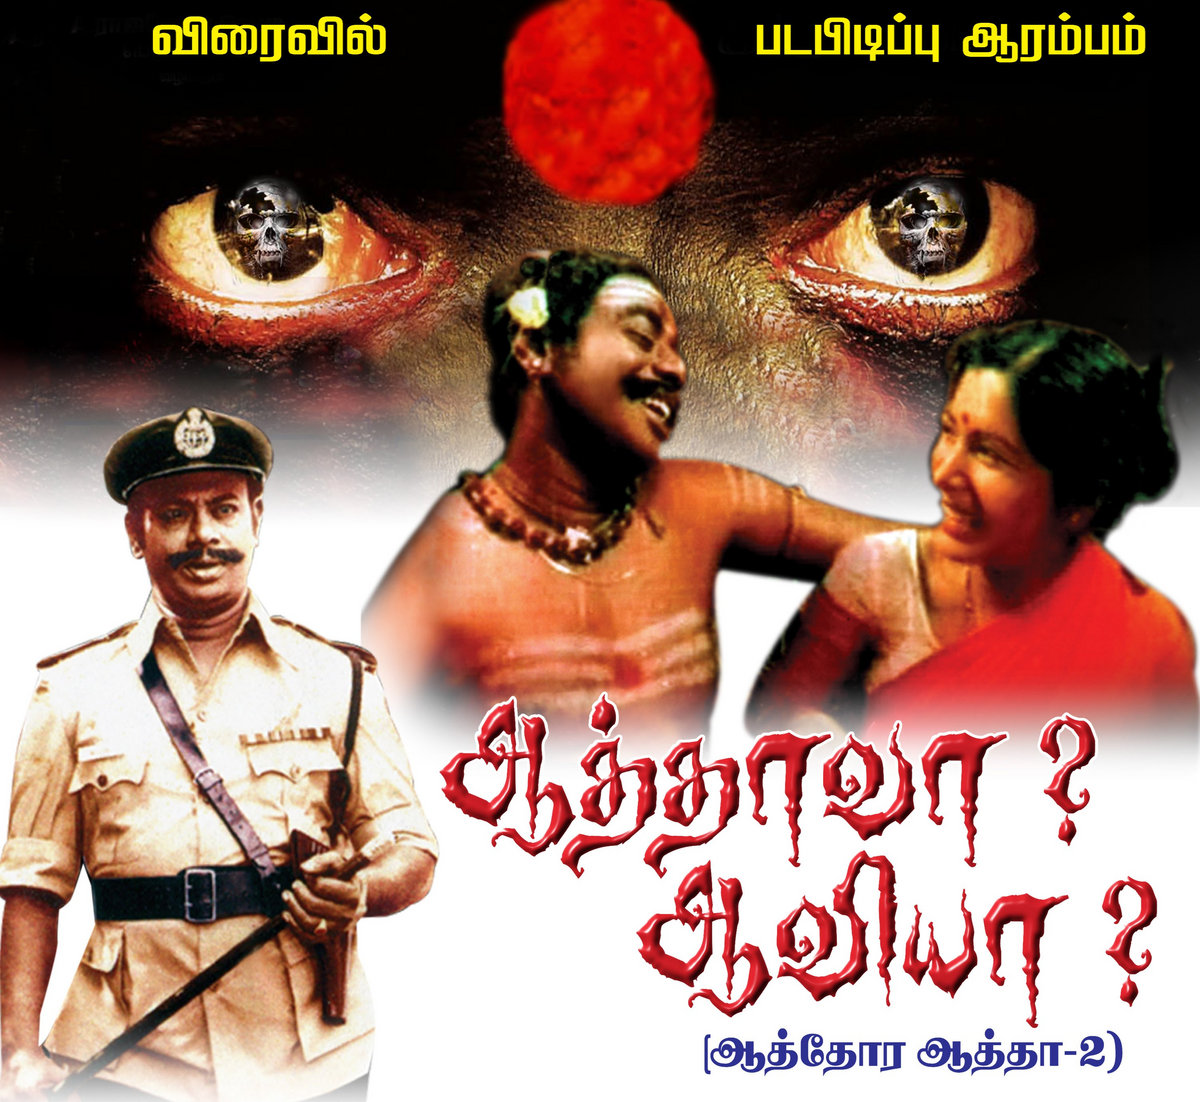 Prem Movie In Tamil Download | pericufab